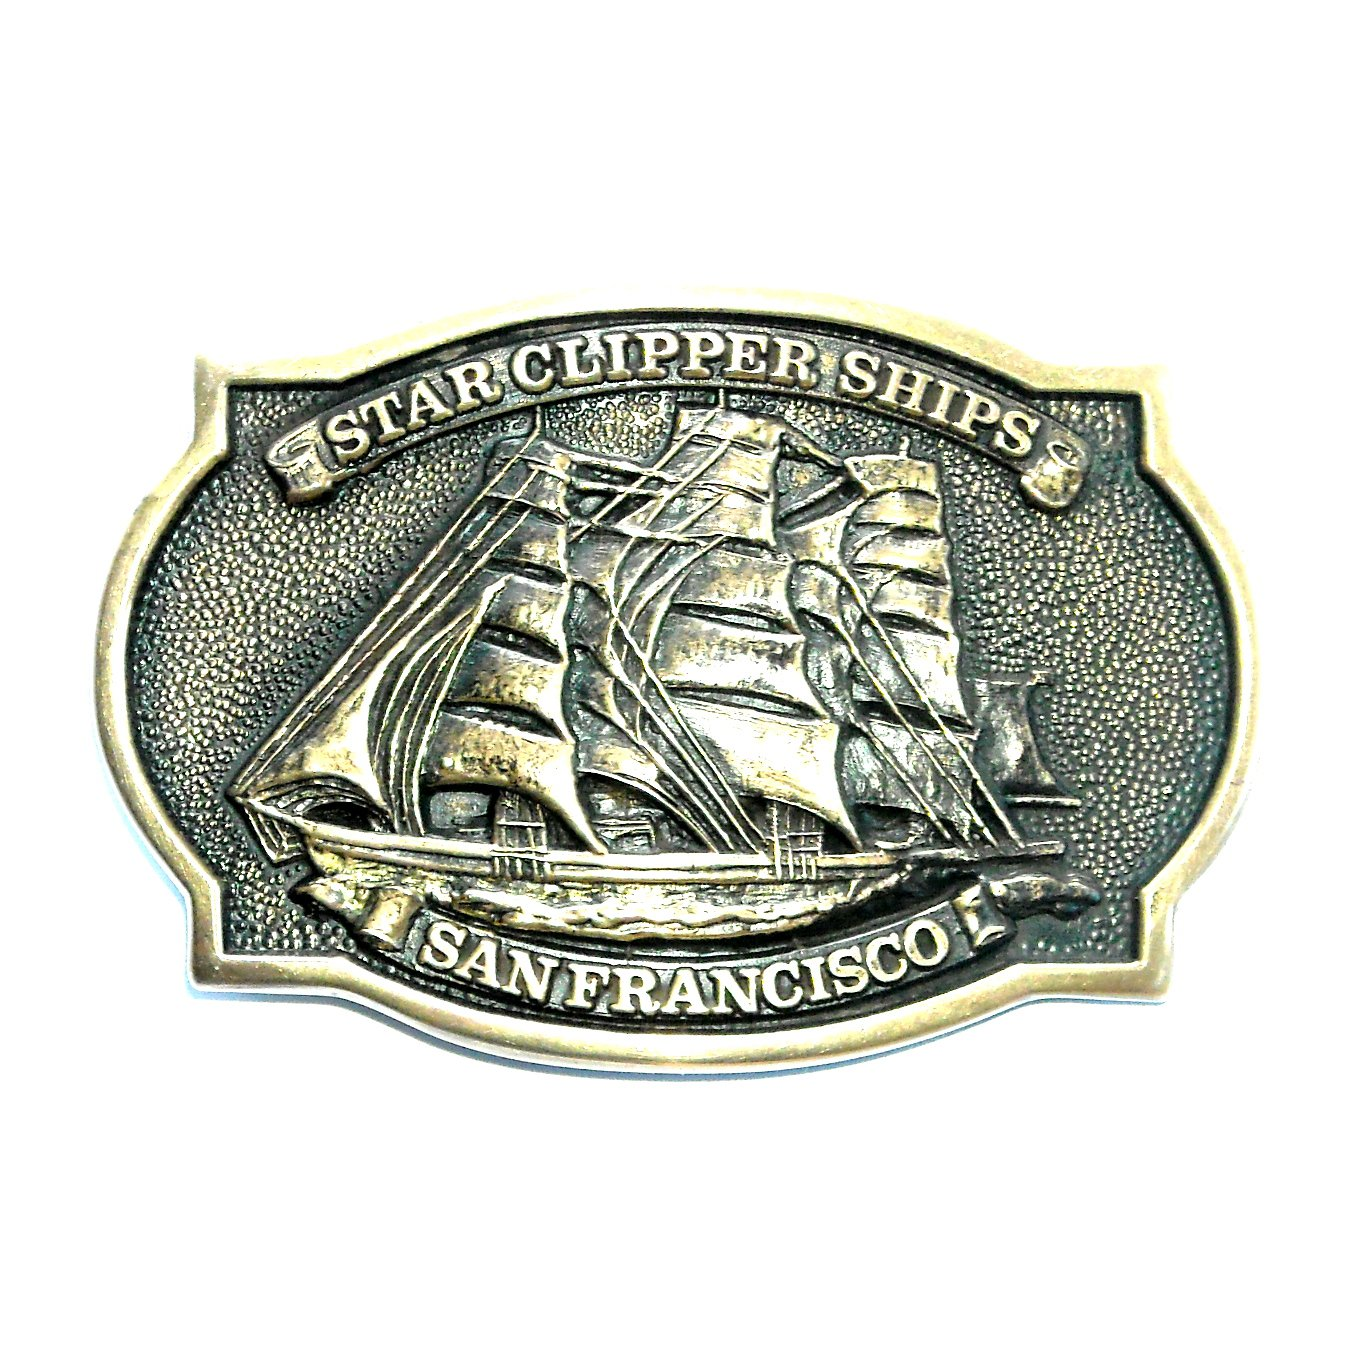 Star Clipper Ships San Francisco BTS Brass Vintage Belt Buckle